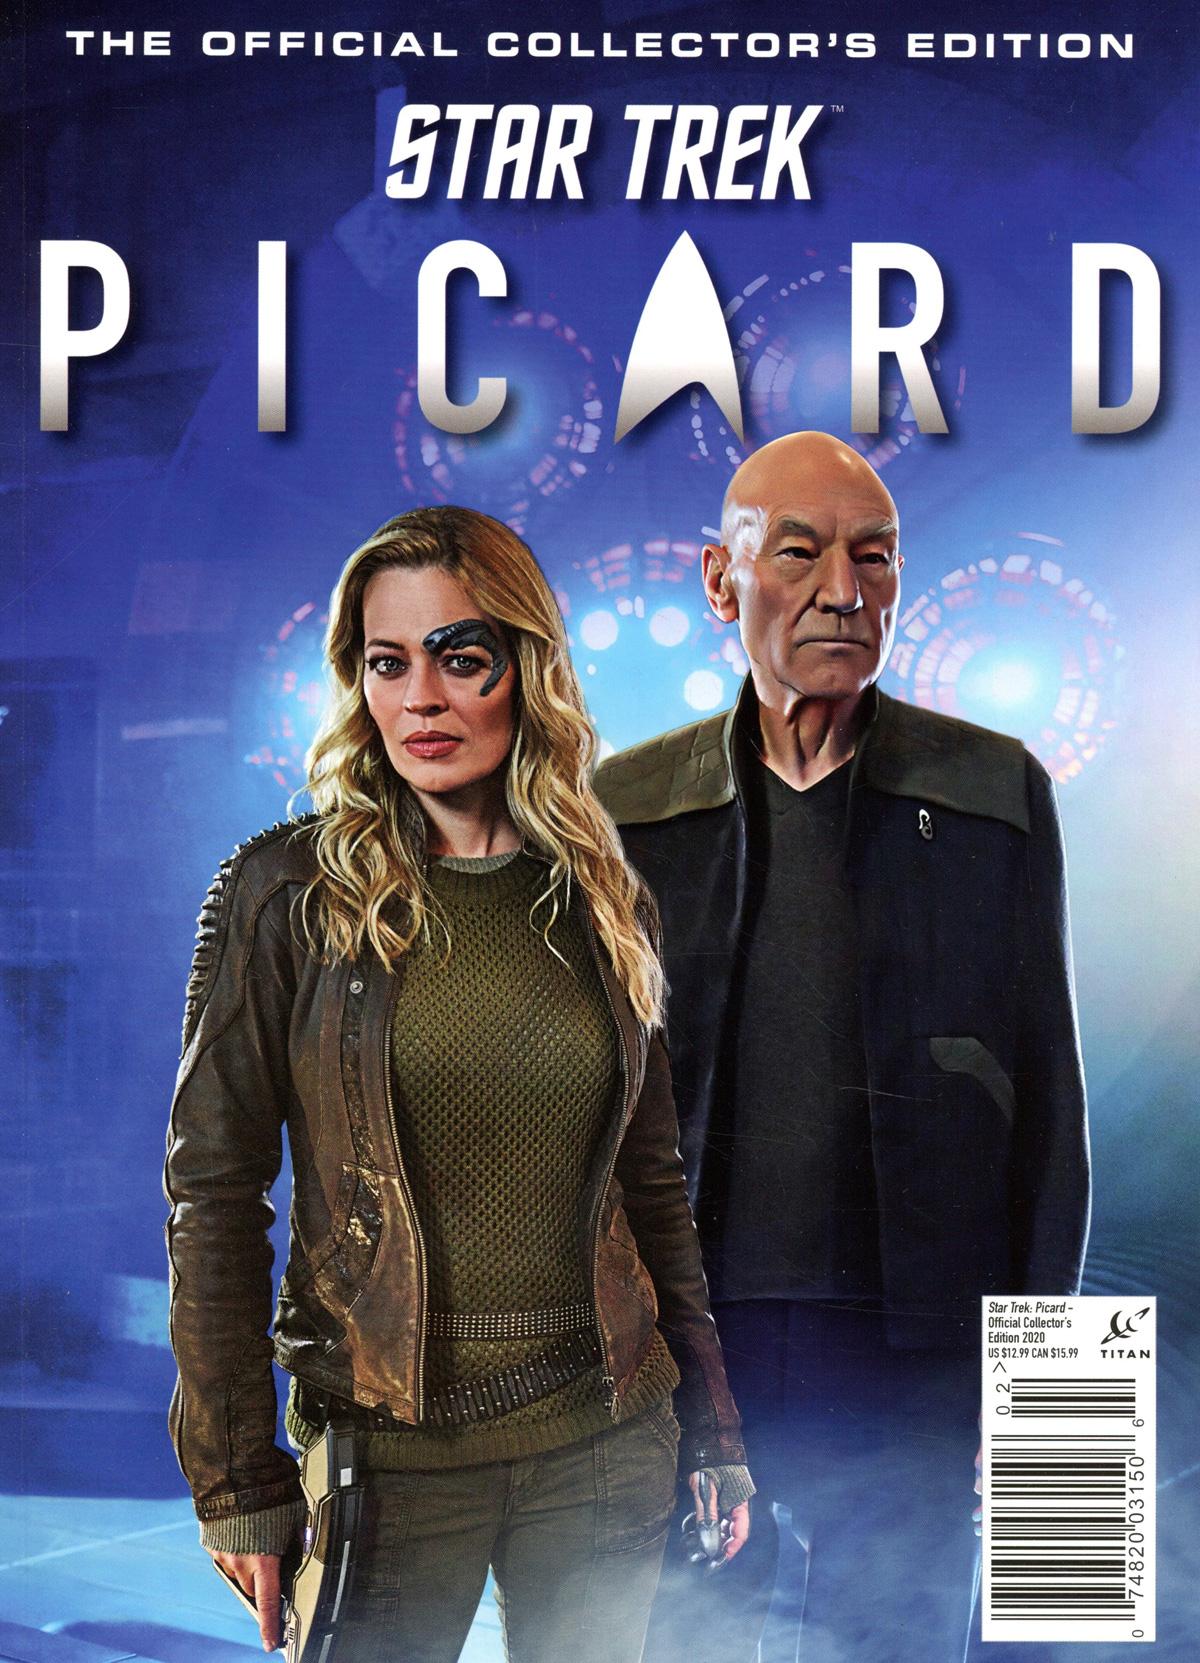 Star Trek Picard Official Collectors Edition 2020 Previews Exclusive Edition